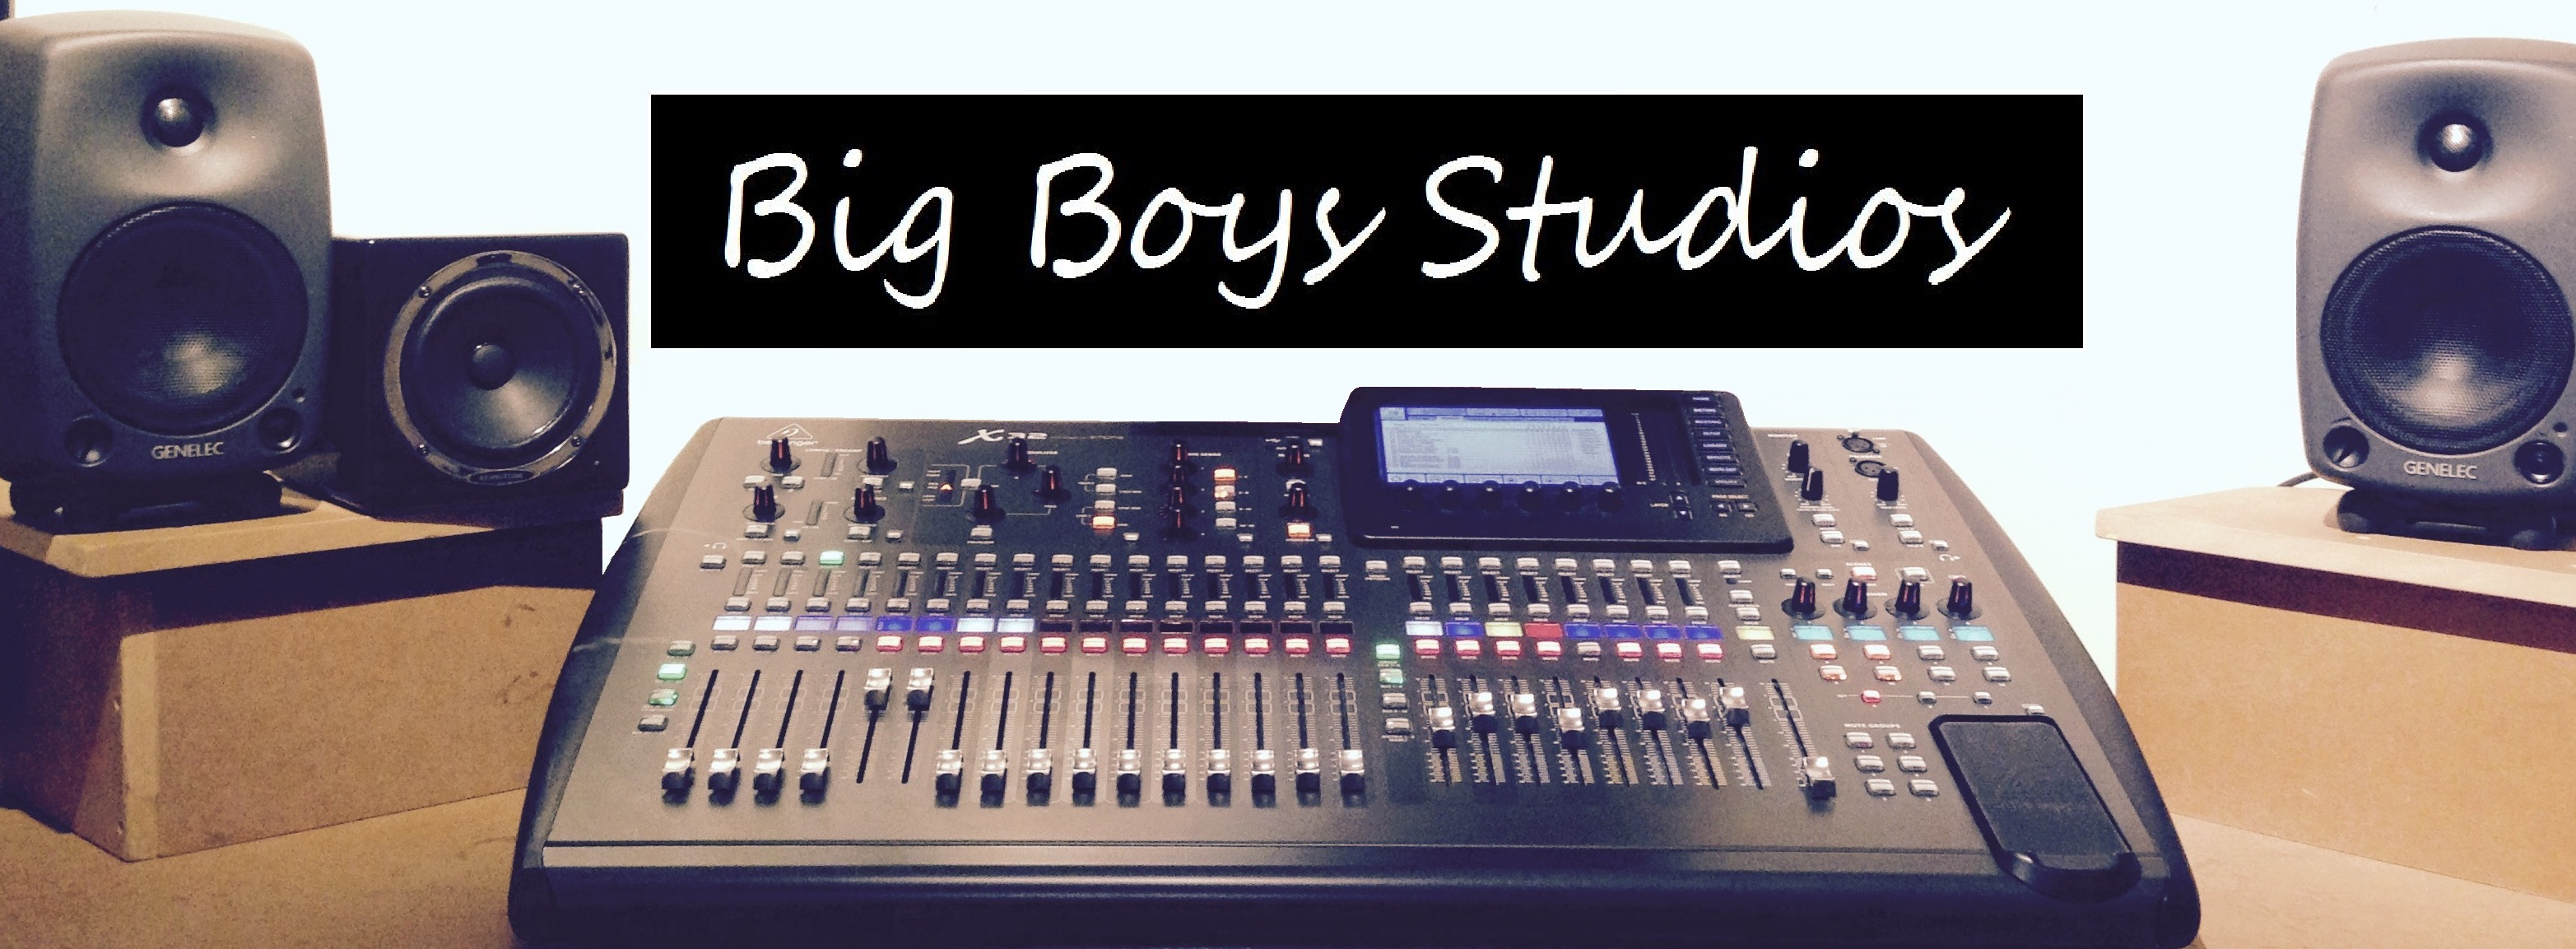 Bigboysstudios5b